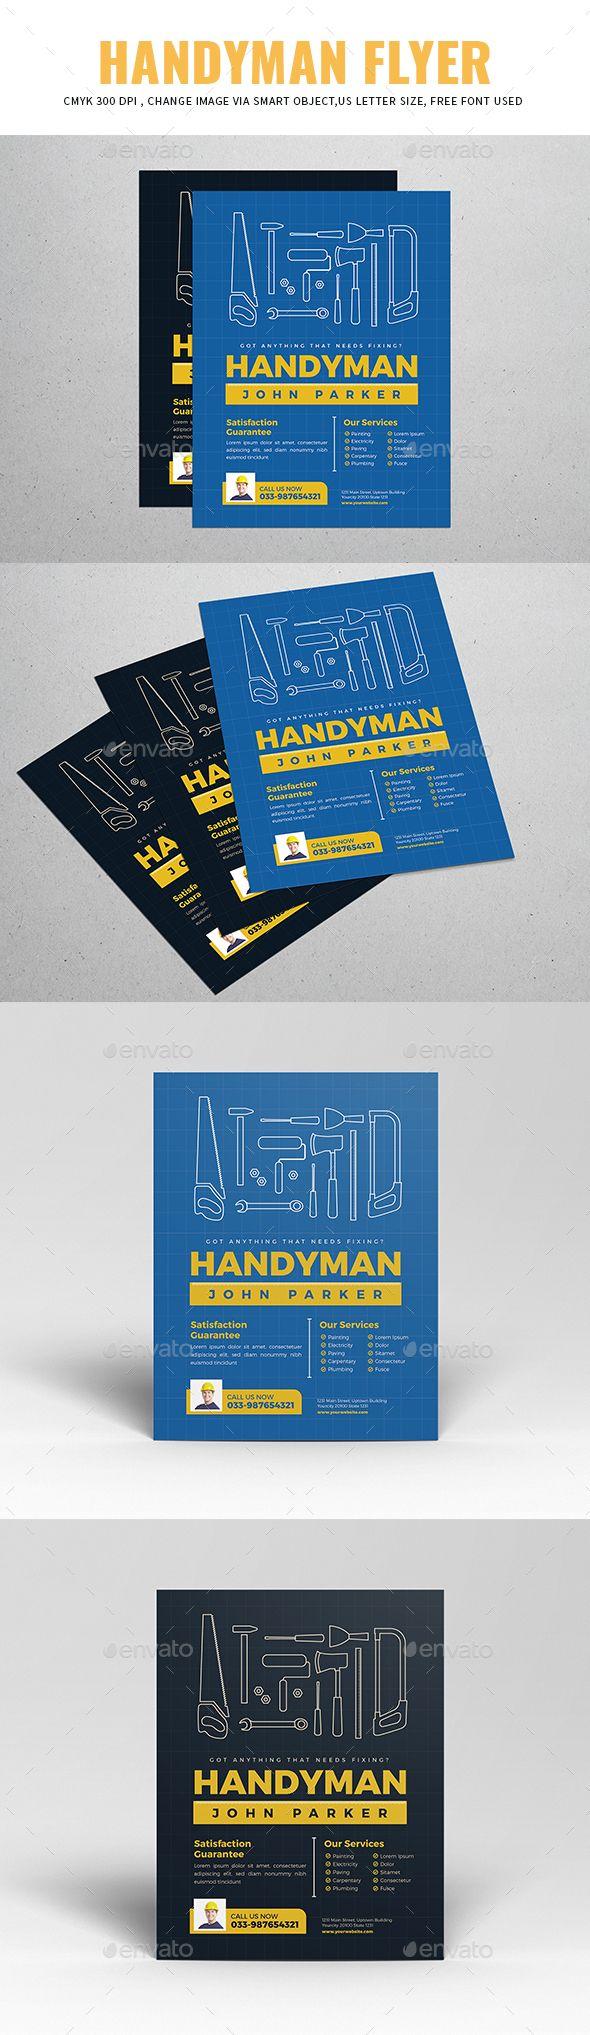 Handyman Flyer Flyers Print Templates Download Here Https